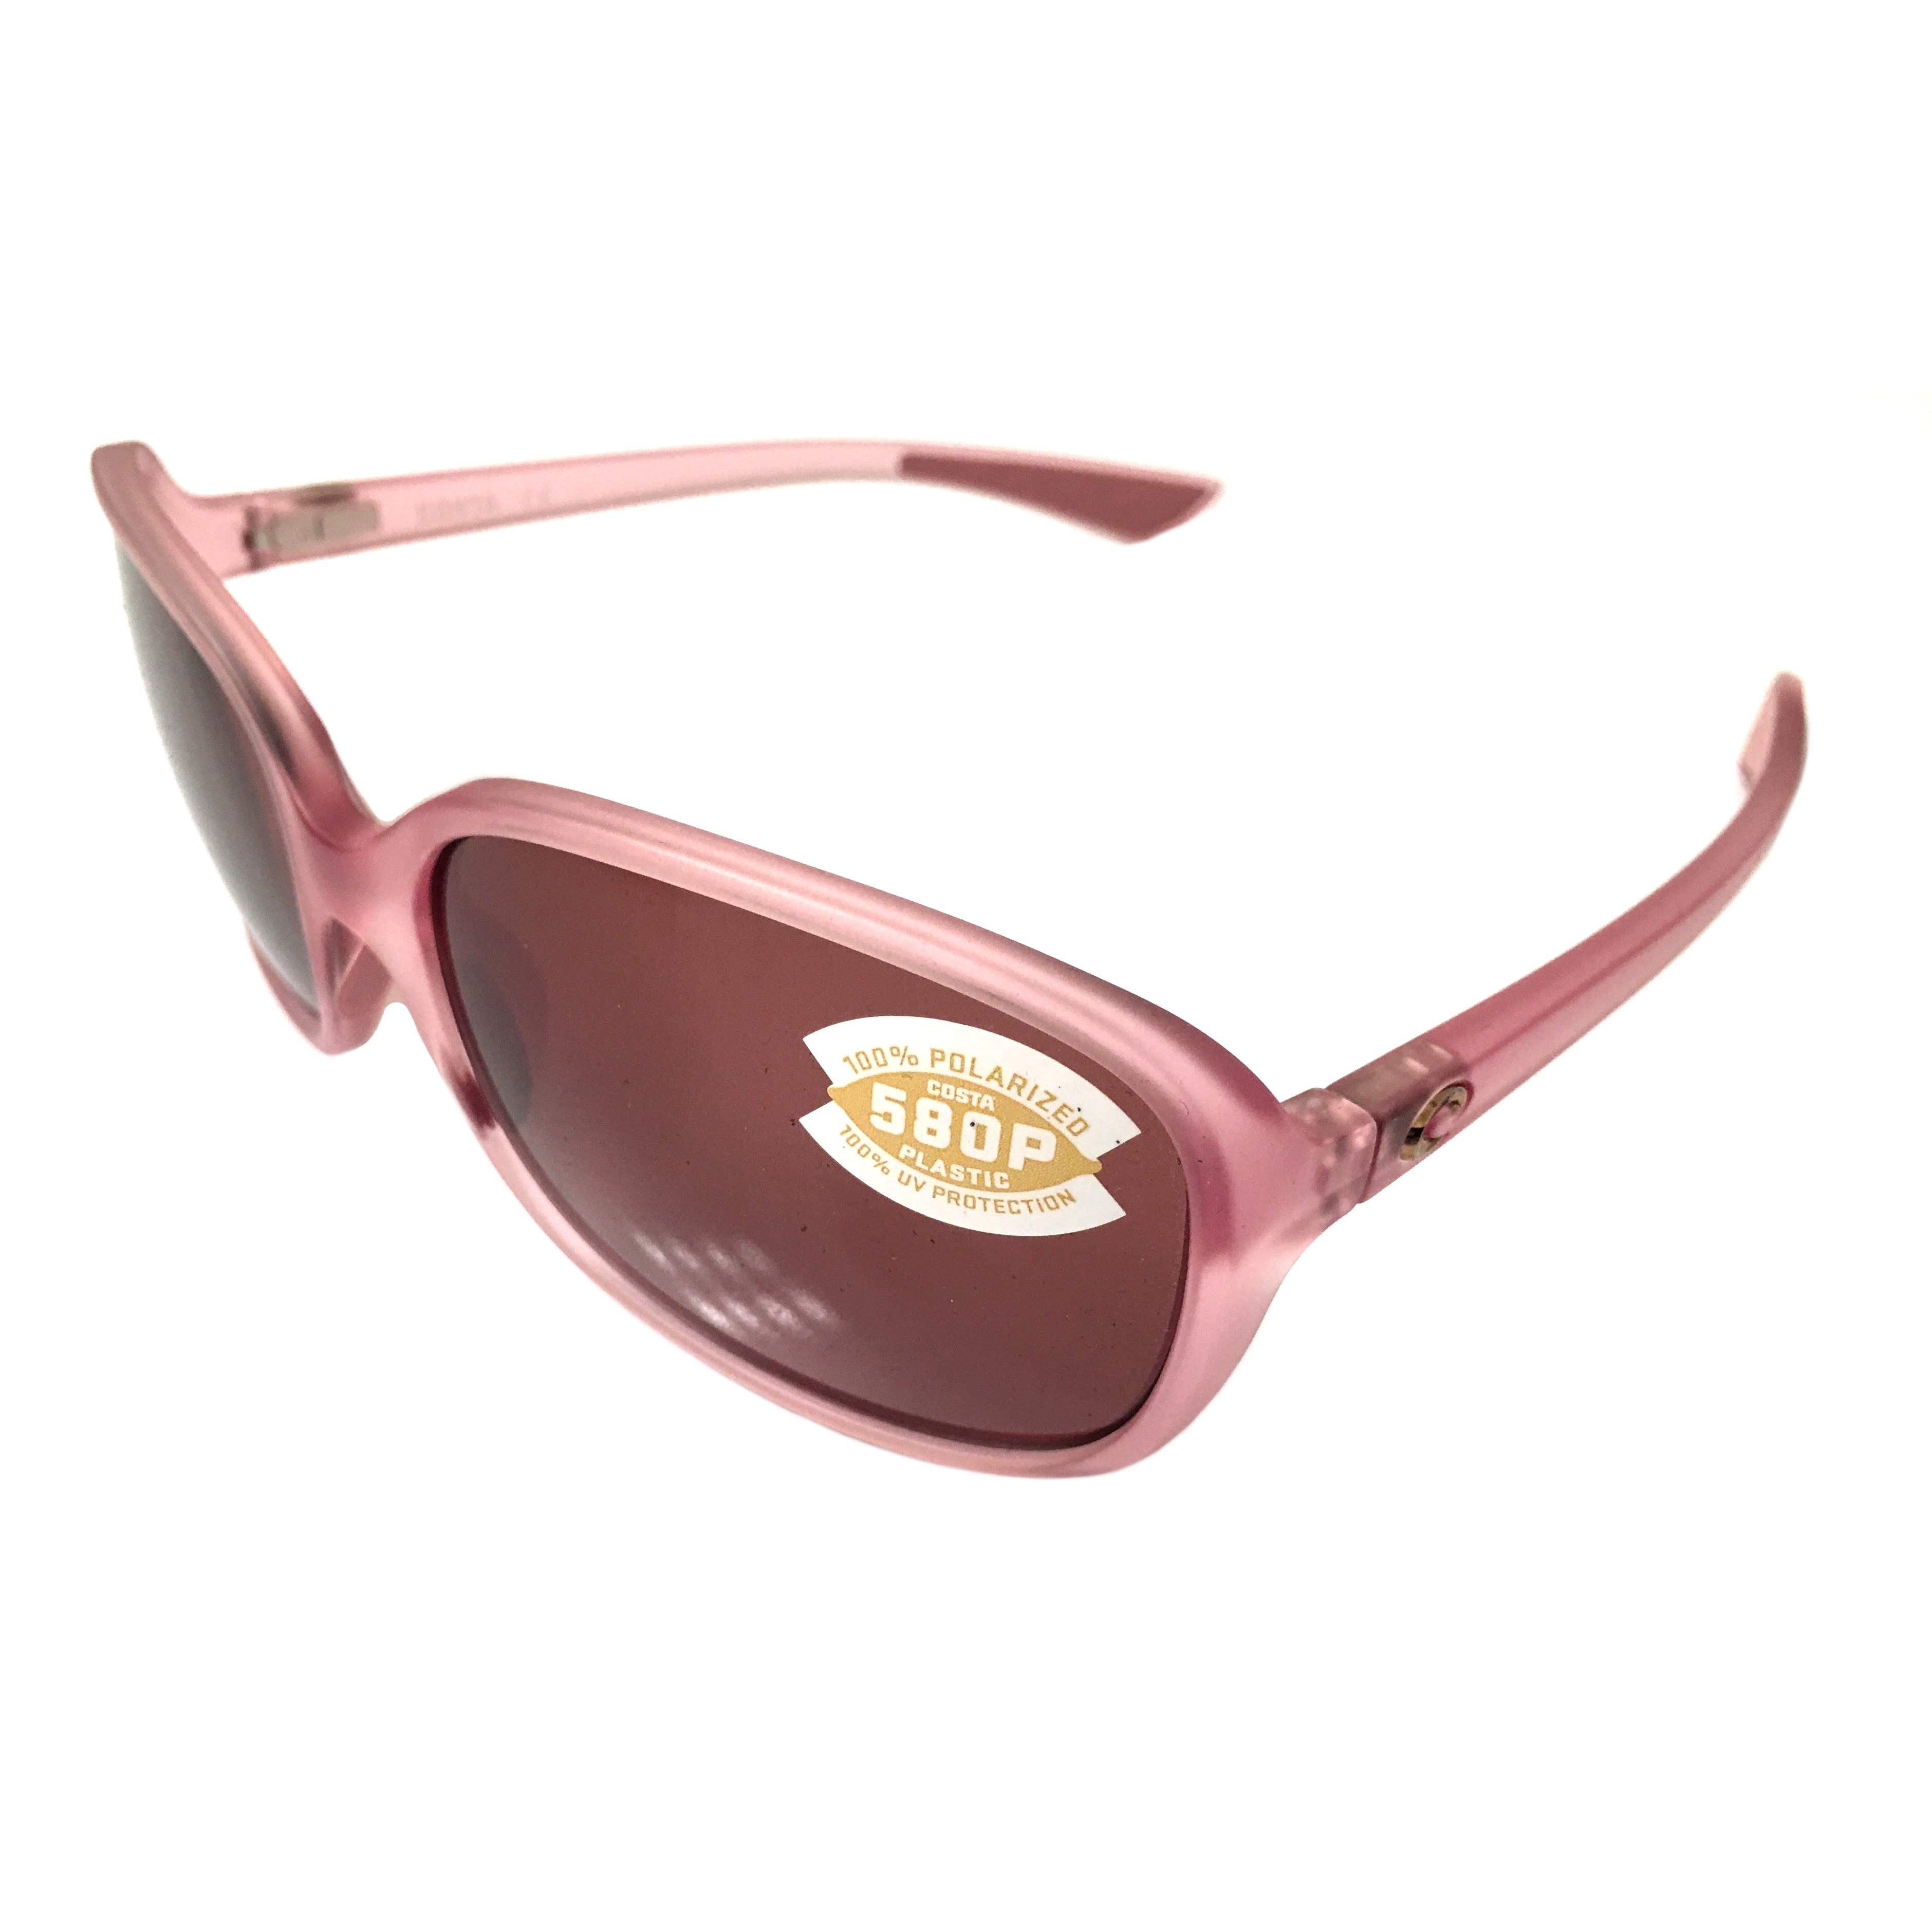 77ad819946f5c Costa Pink Inlet Polarized Pink Costa Sunglasses  Costa Del Mar Riverton  Sunglasses Matte Hibiscus Crystal